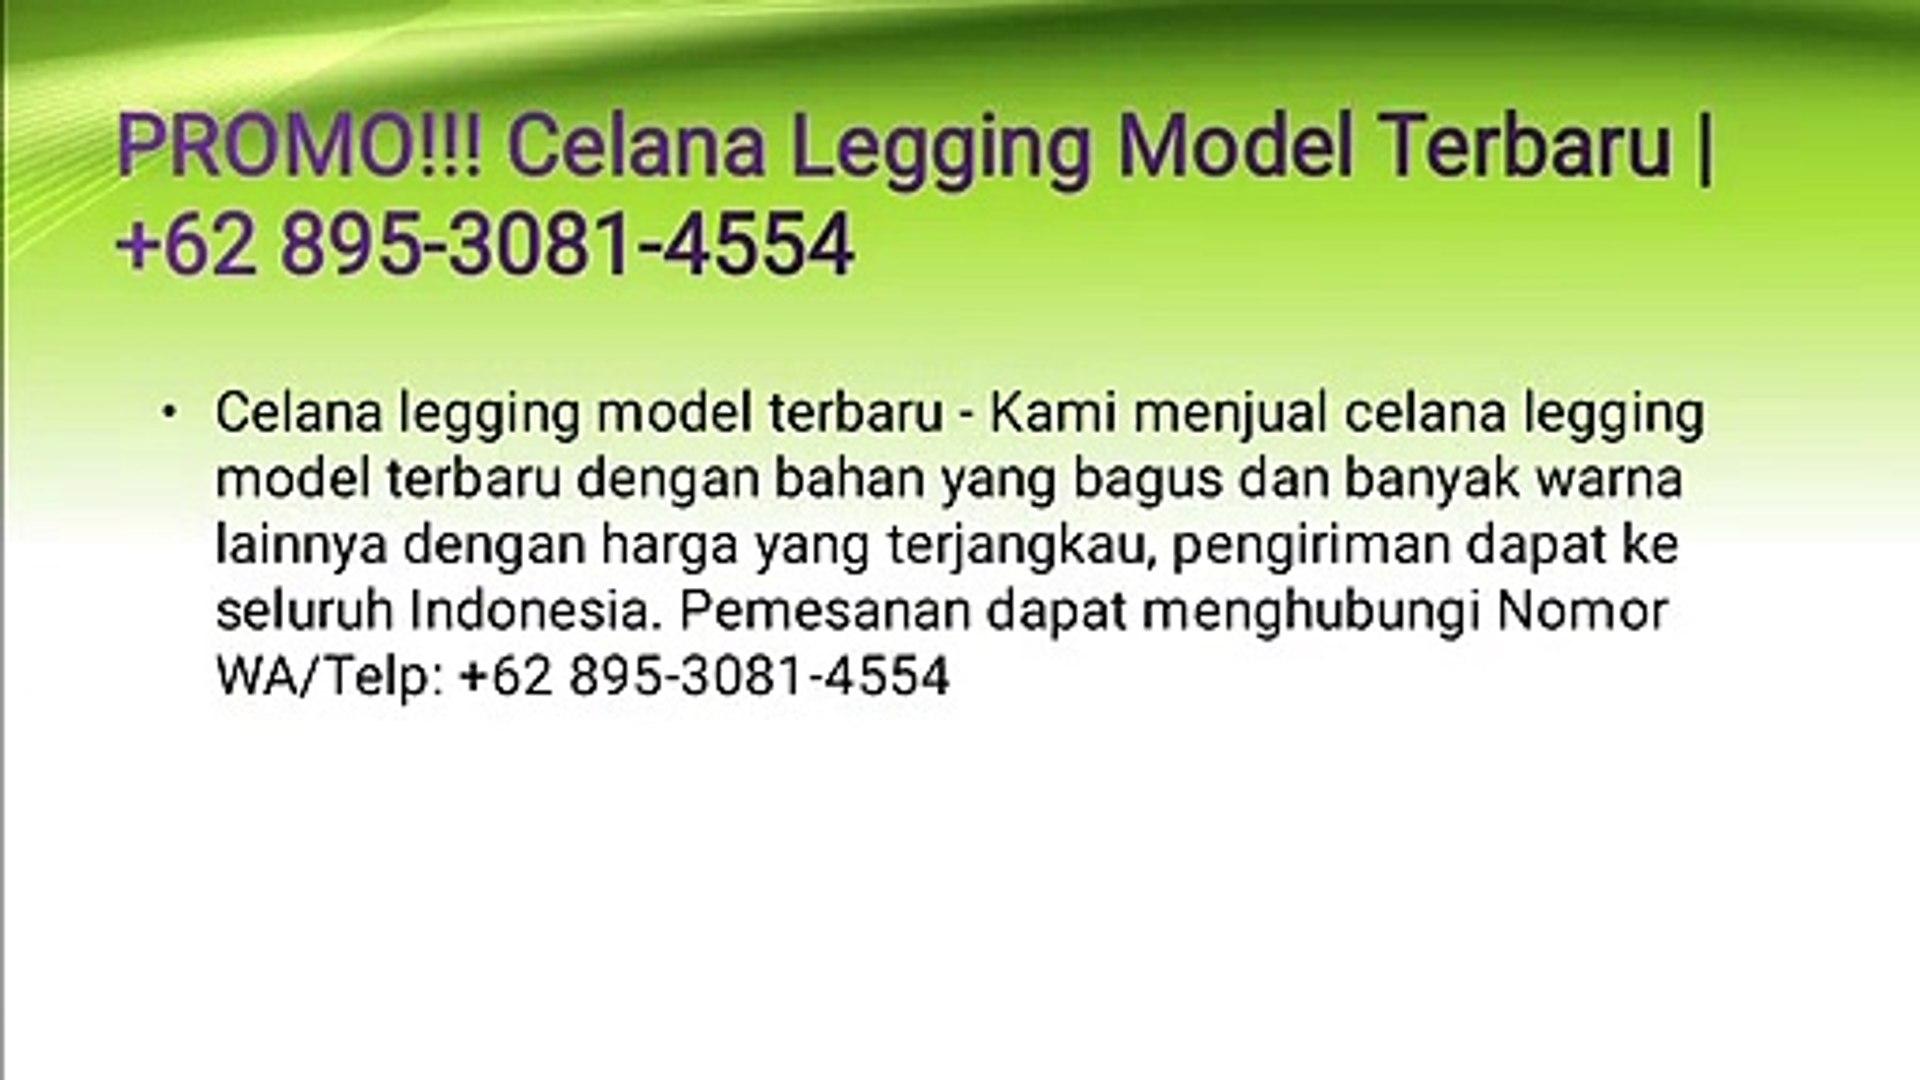 Agen Celana Legging Model Terbaru 62 895 3081 4554 Video Dailymotion